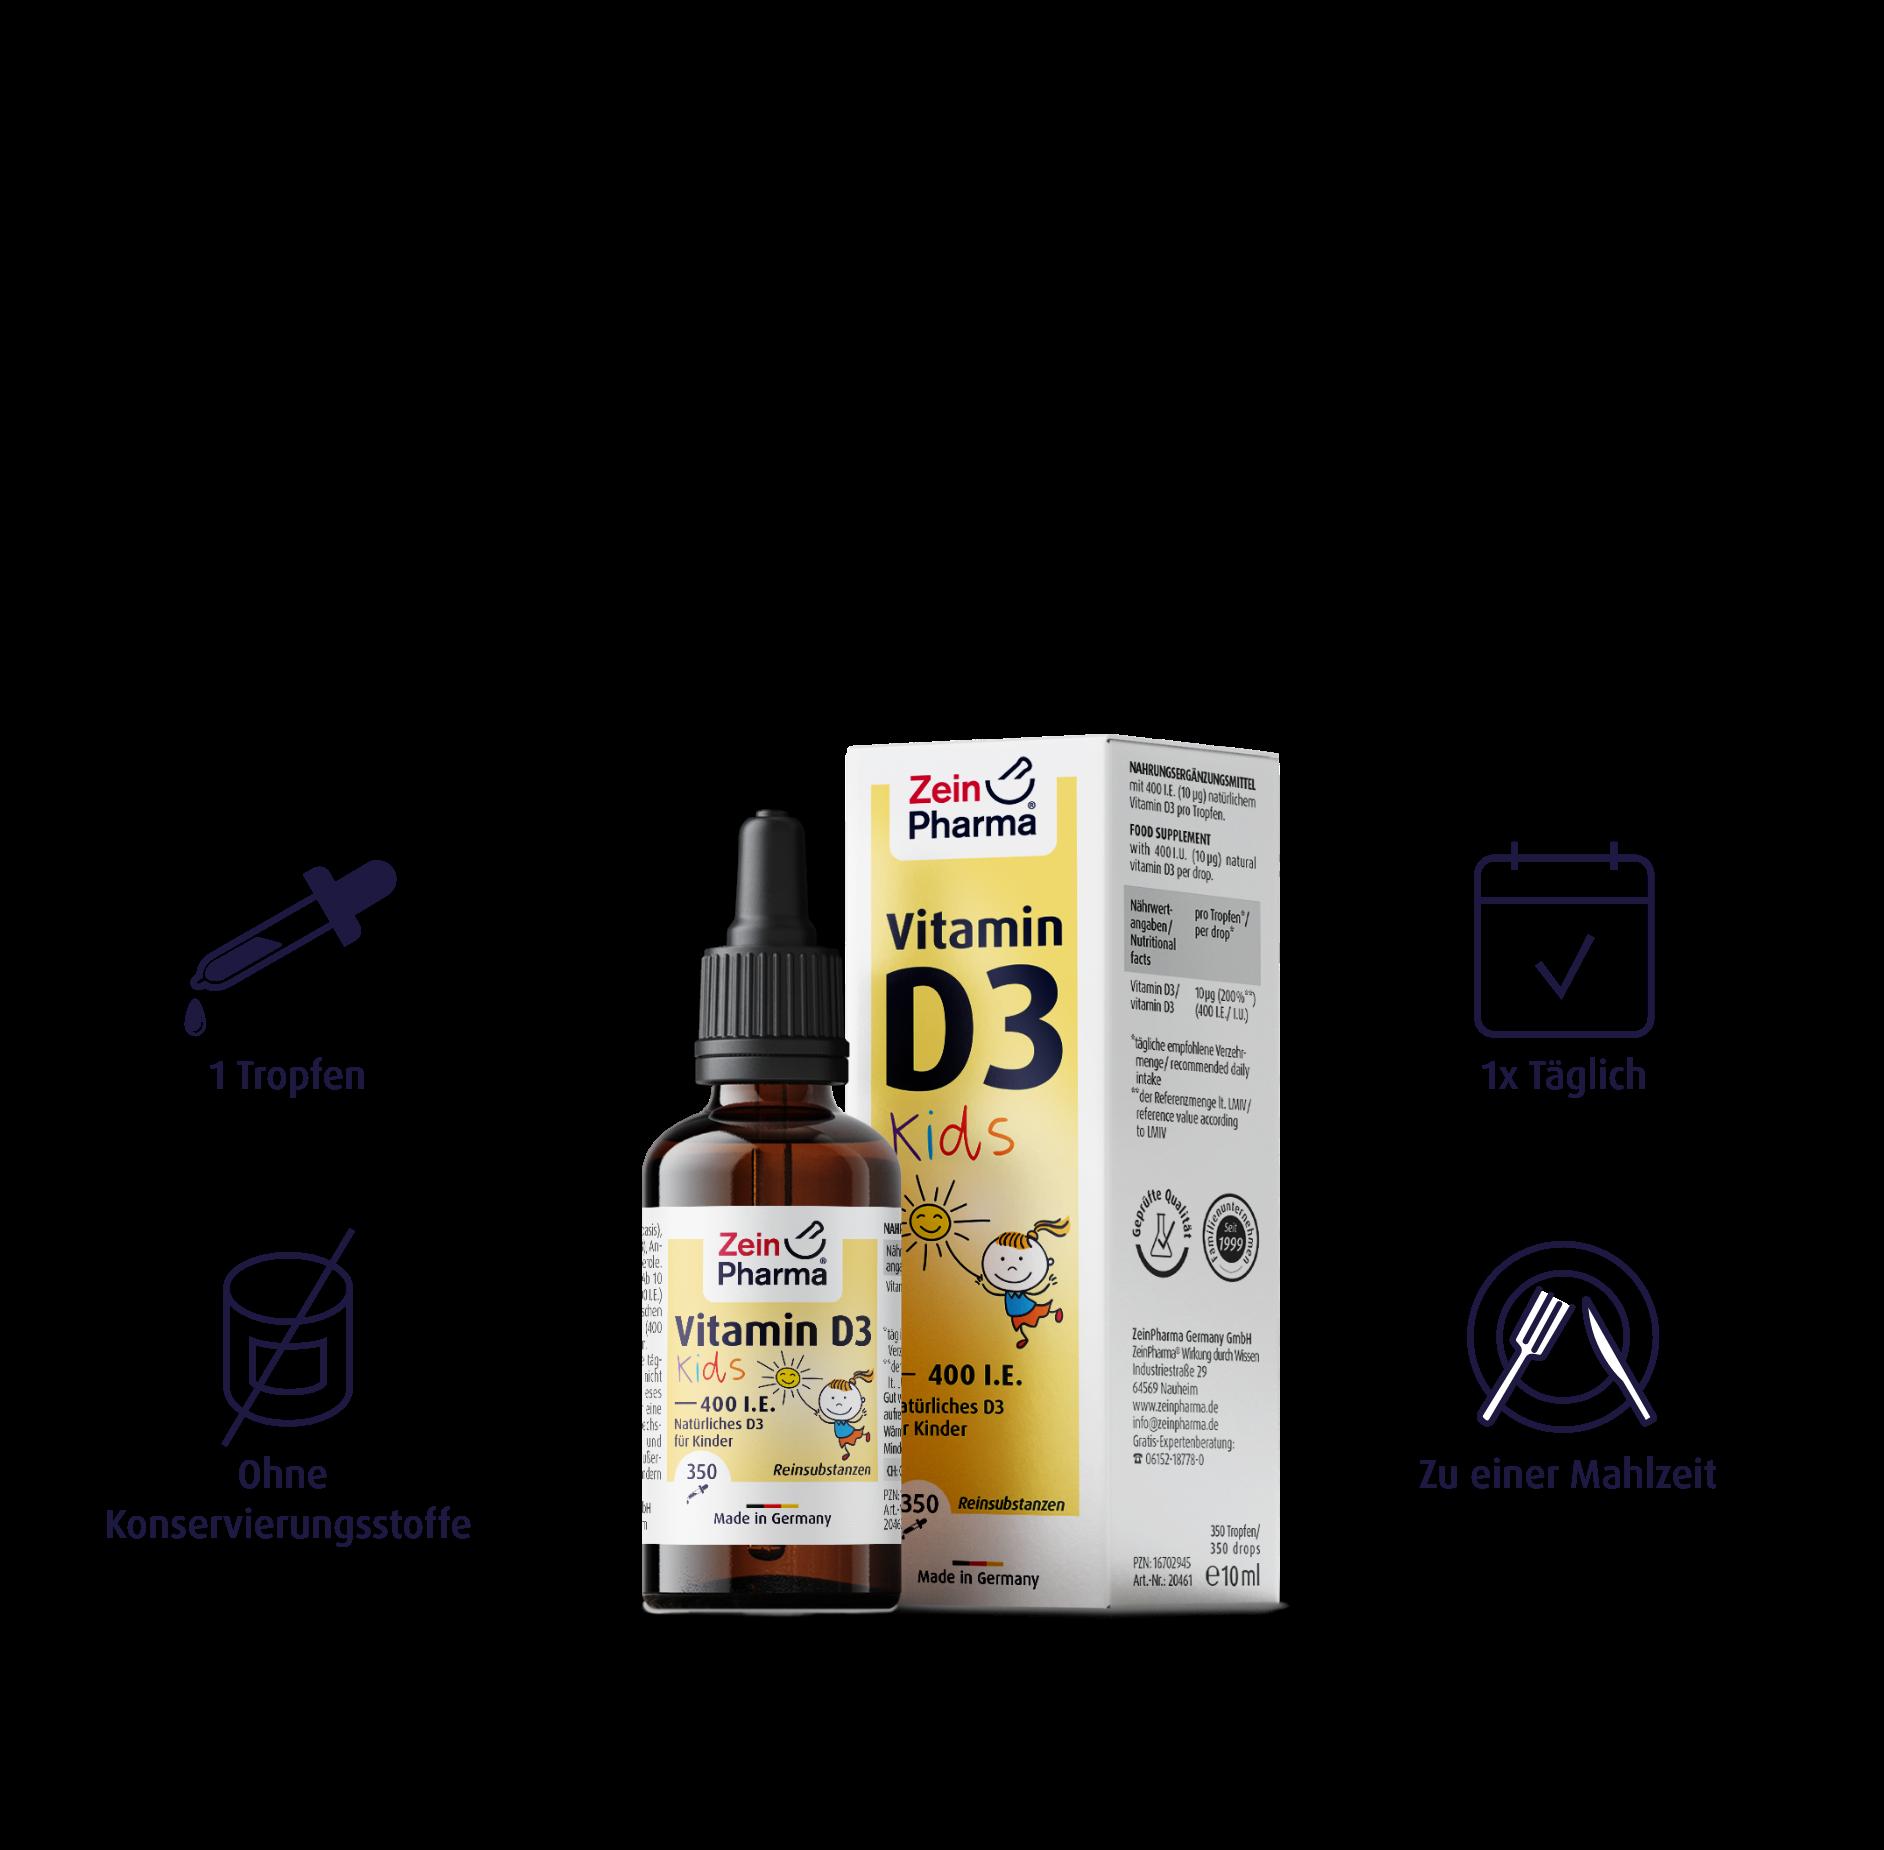 Vitamin D3 Tropfen für Kinder 400 I.E.